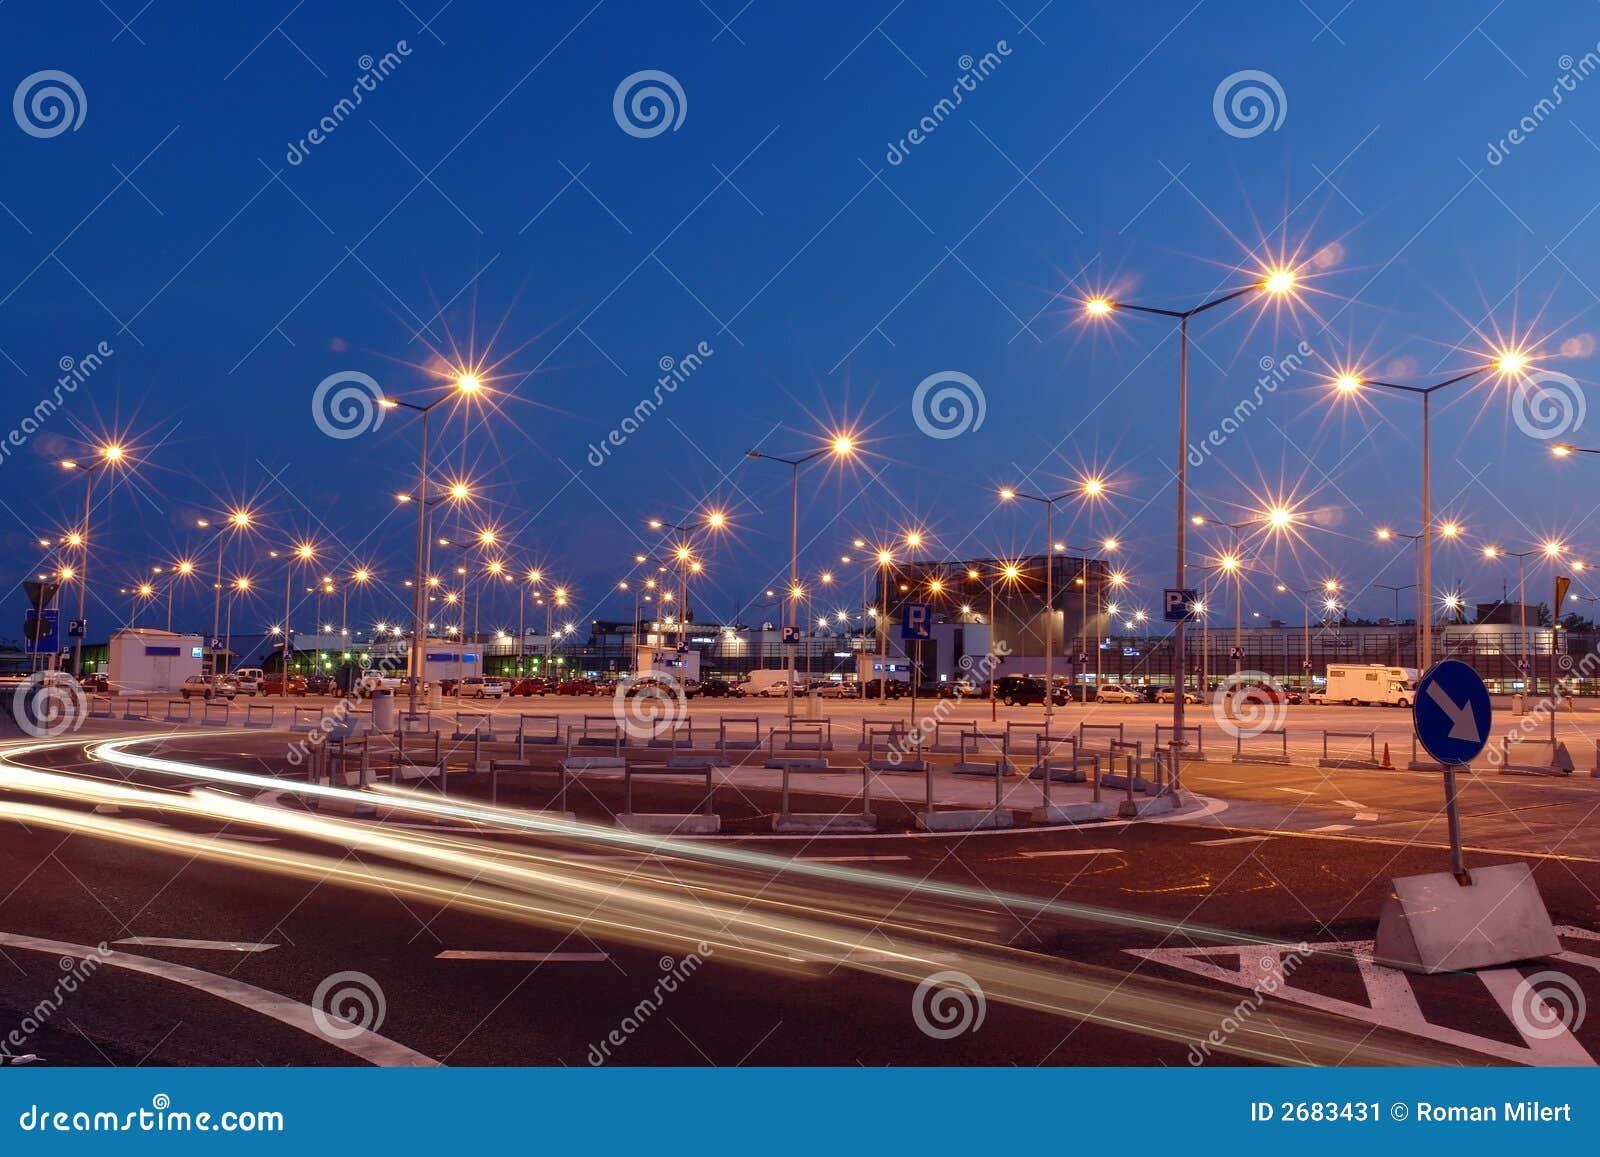 Indicatori luminosi del parcheggio